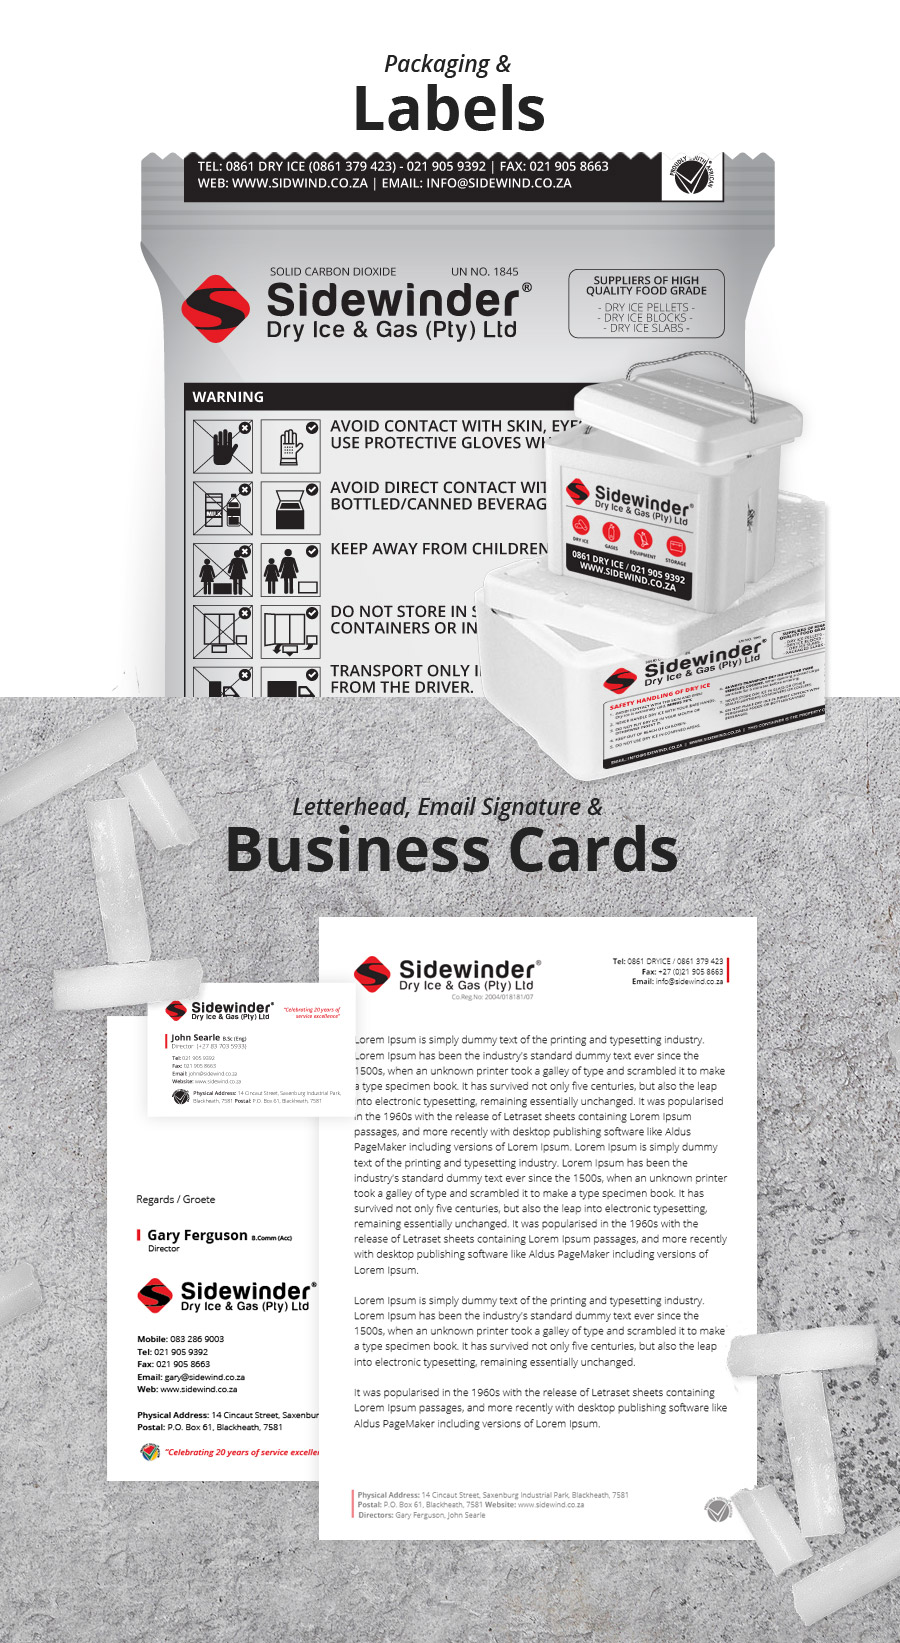 Sidewinder Packaging & Stationery